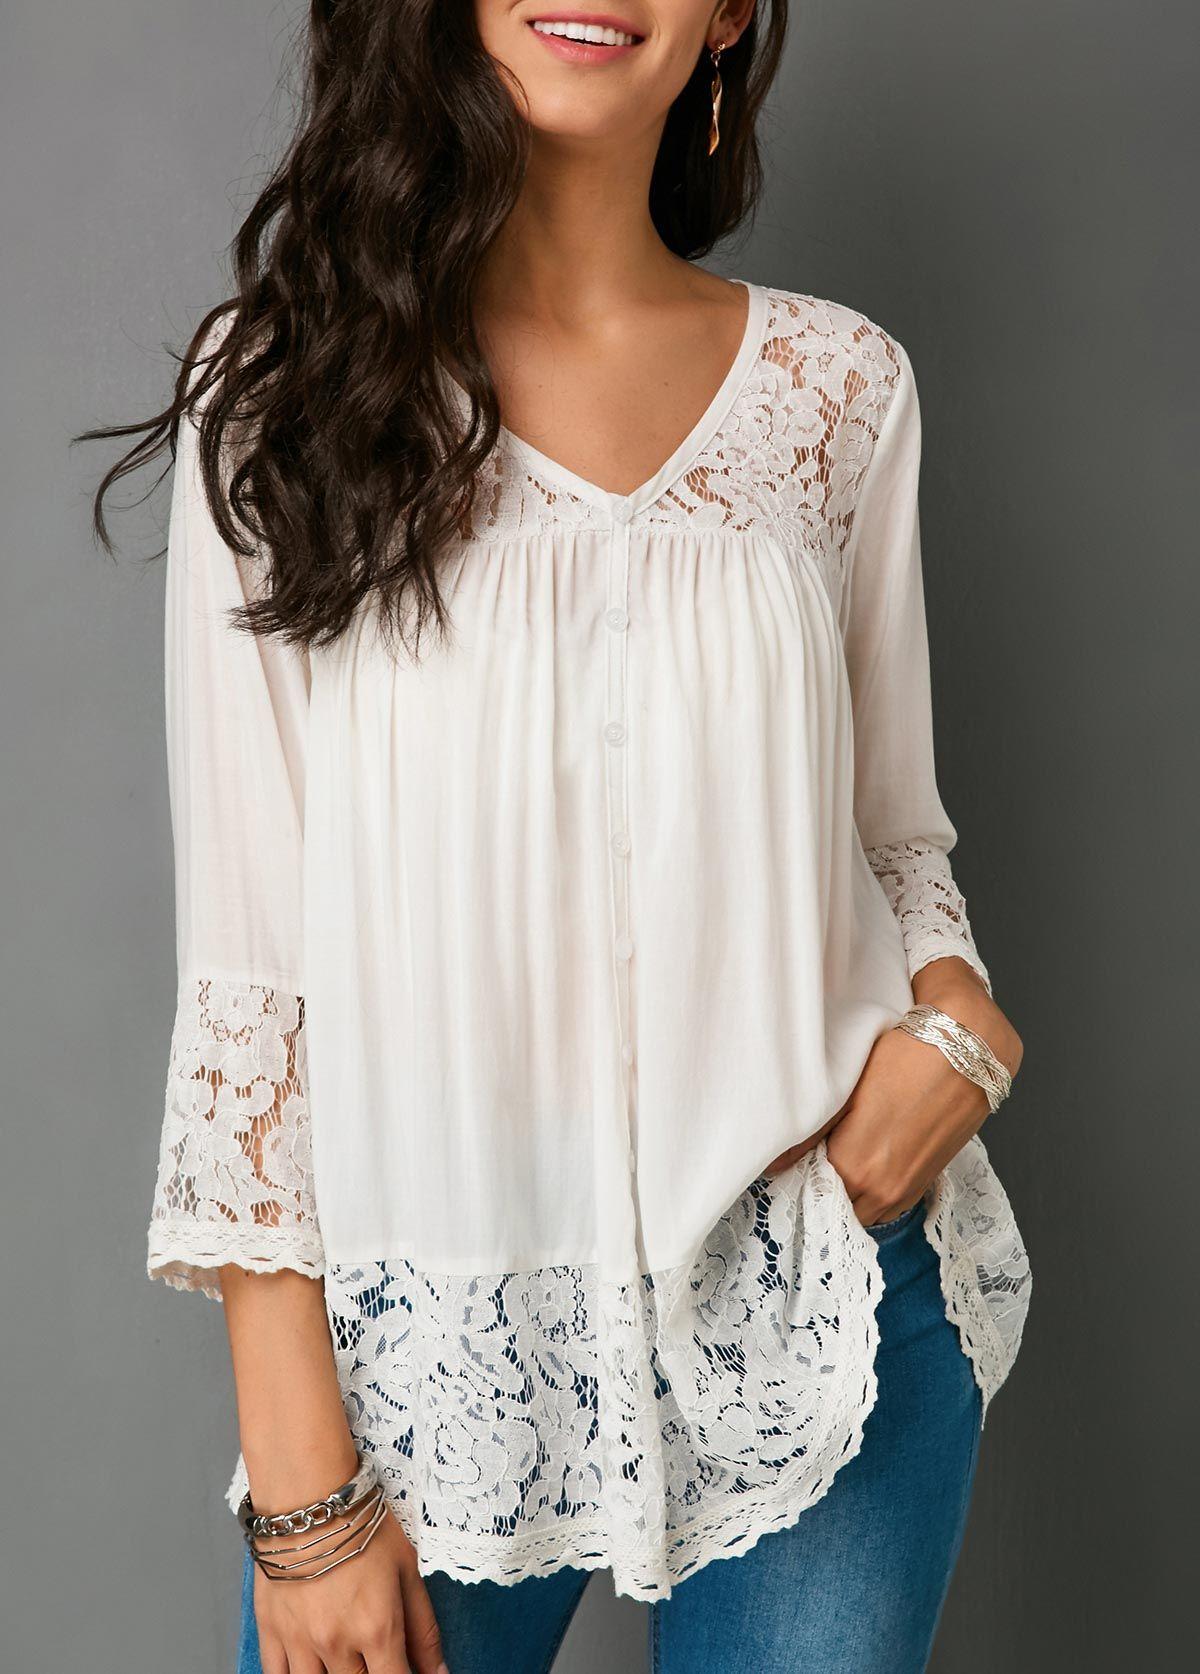 Lace Patchwork Button Up White Blouse Vintage Clothing Blouse